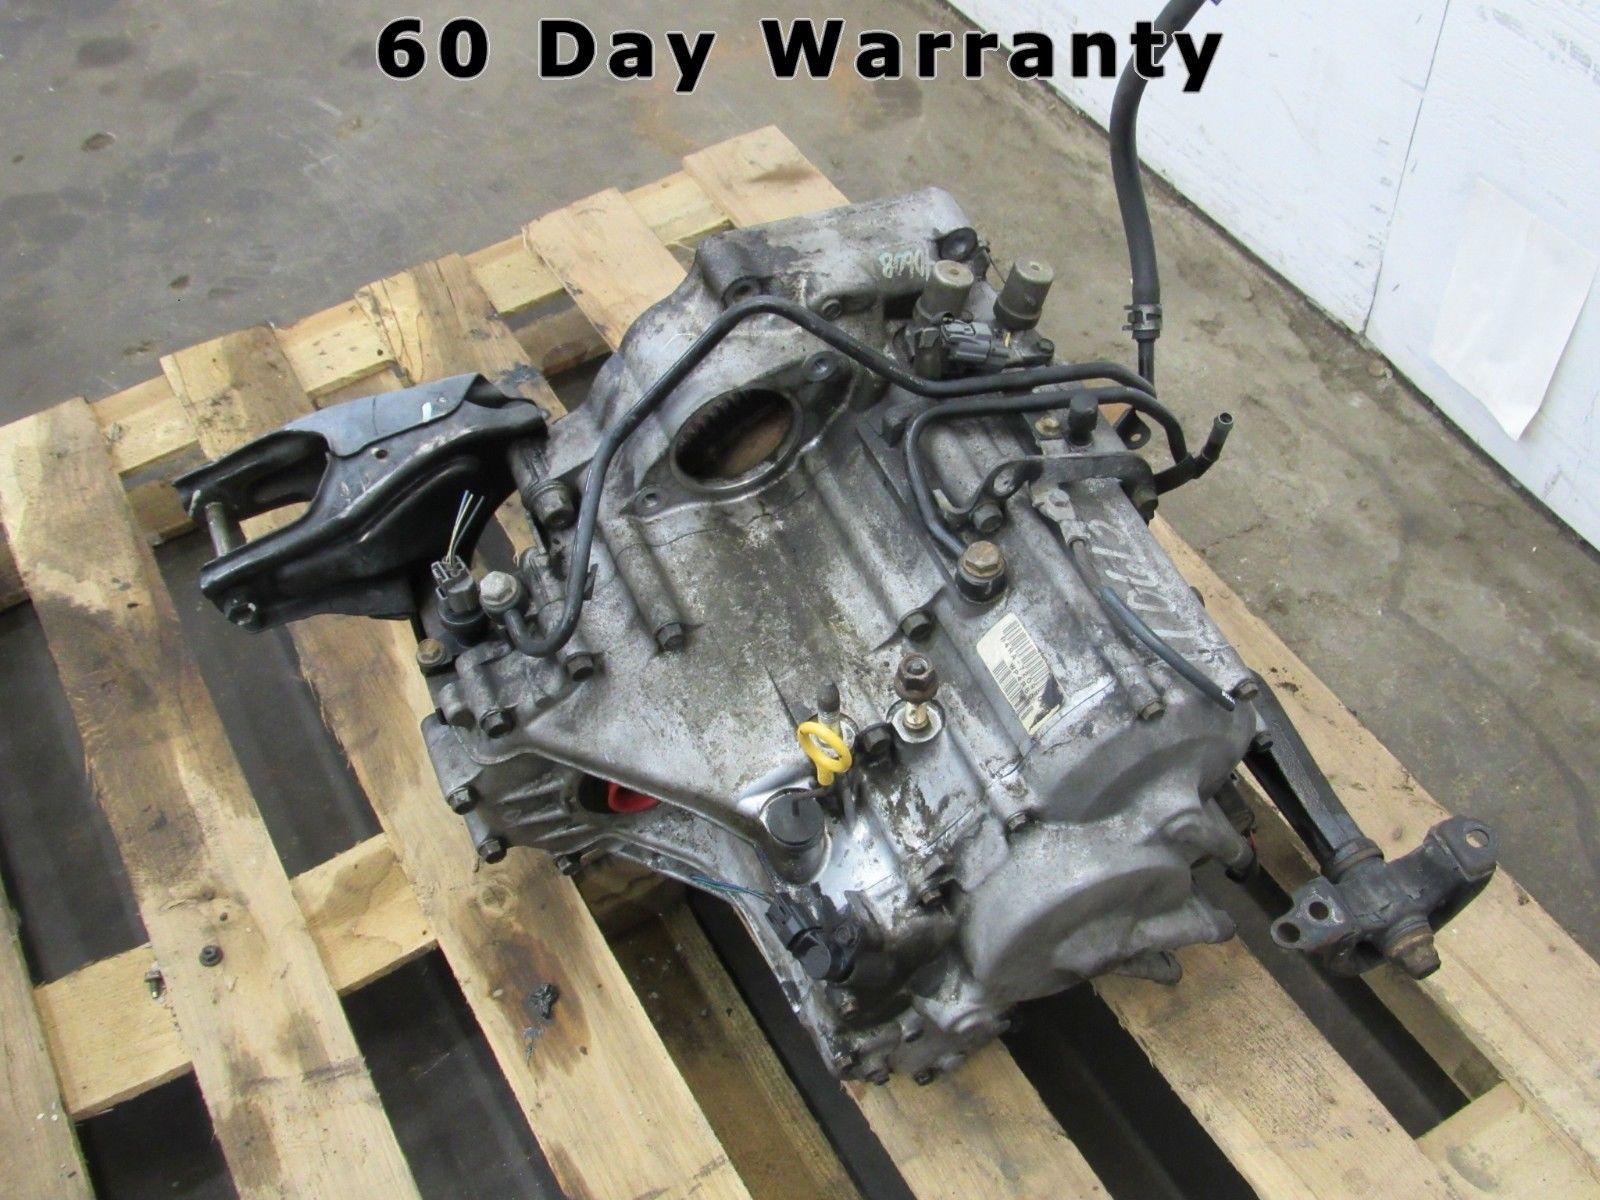 96 00 Honda Civic Ex Automatic Transmission Auto Trans D16y8 60 Day Warranty A Importapart